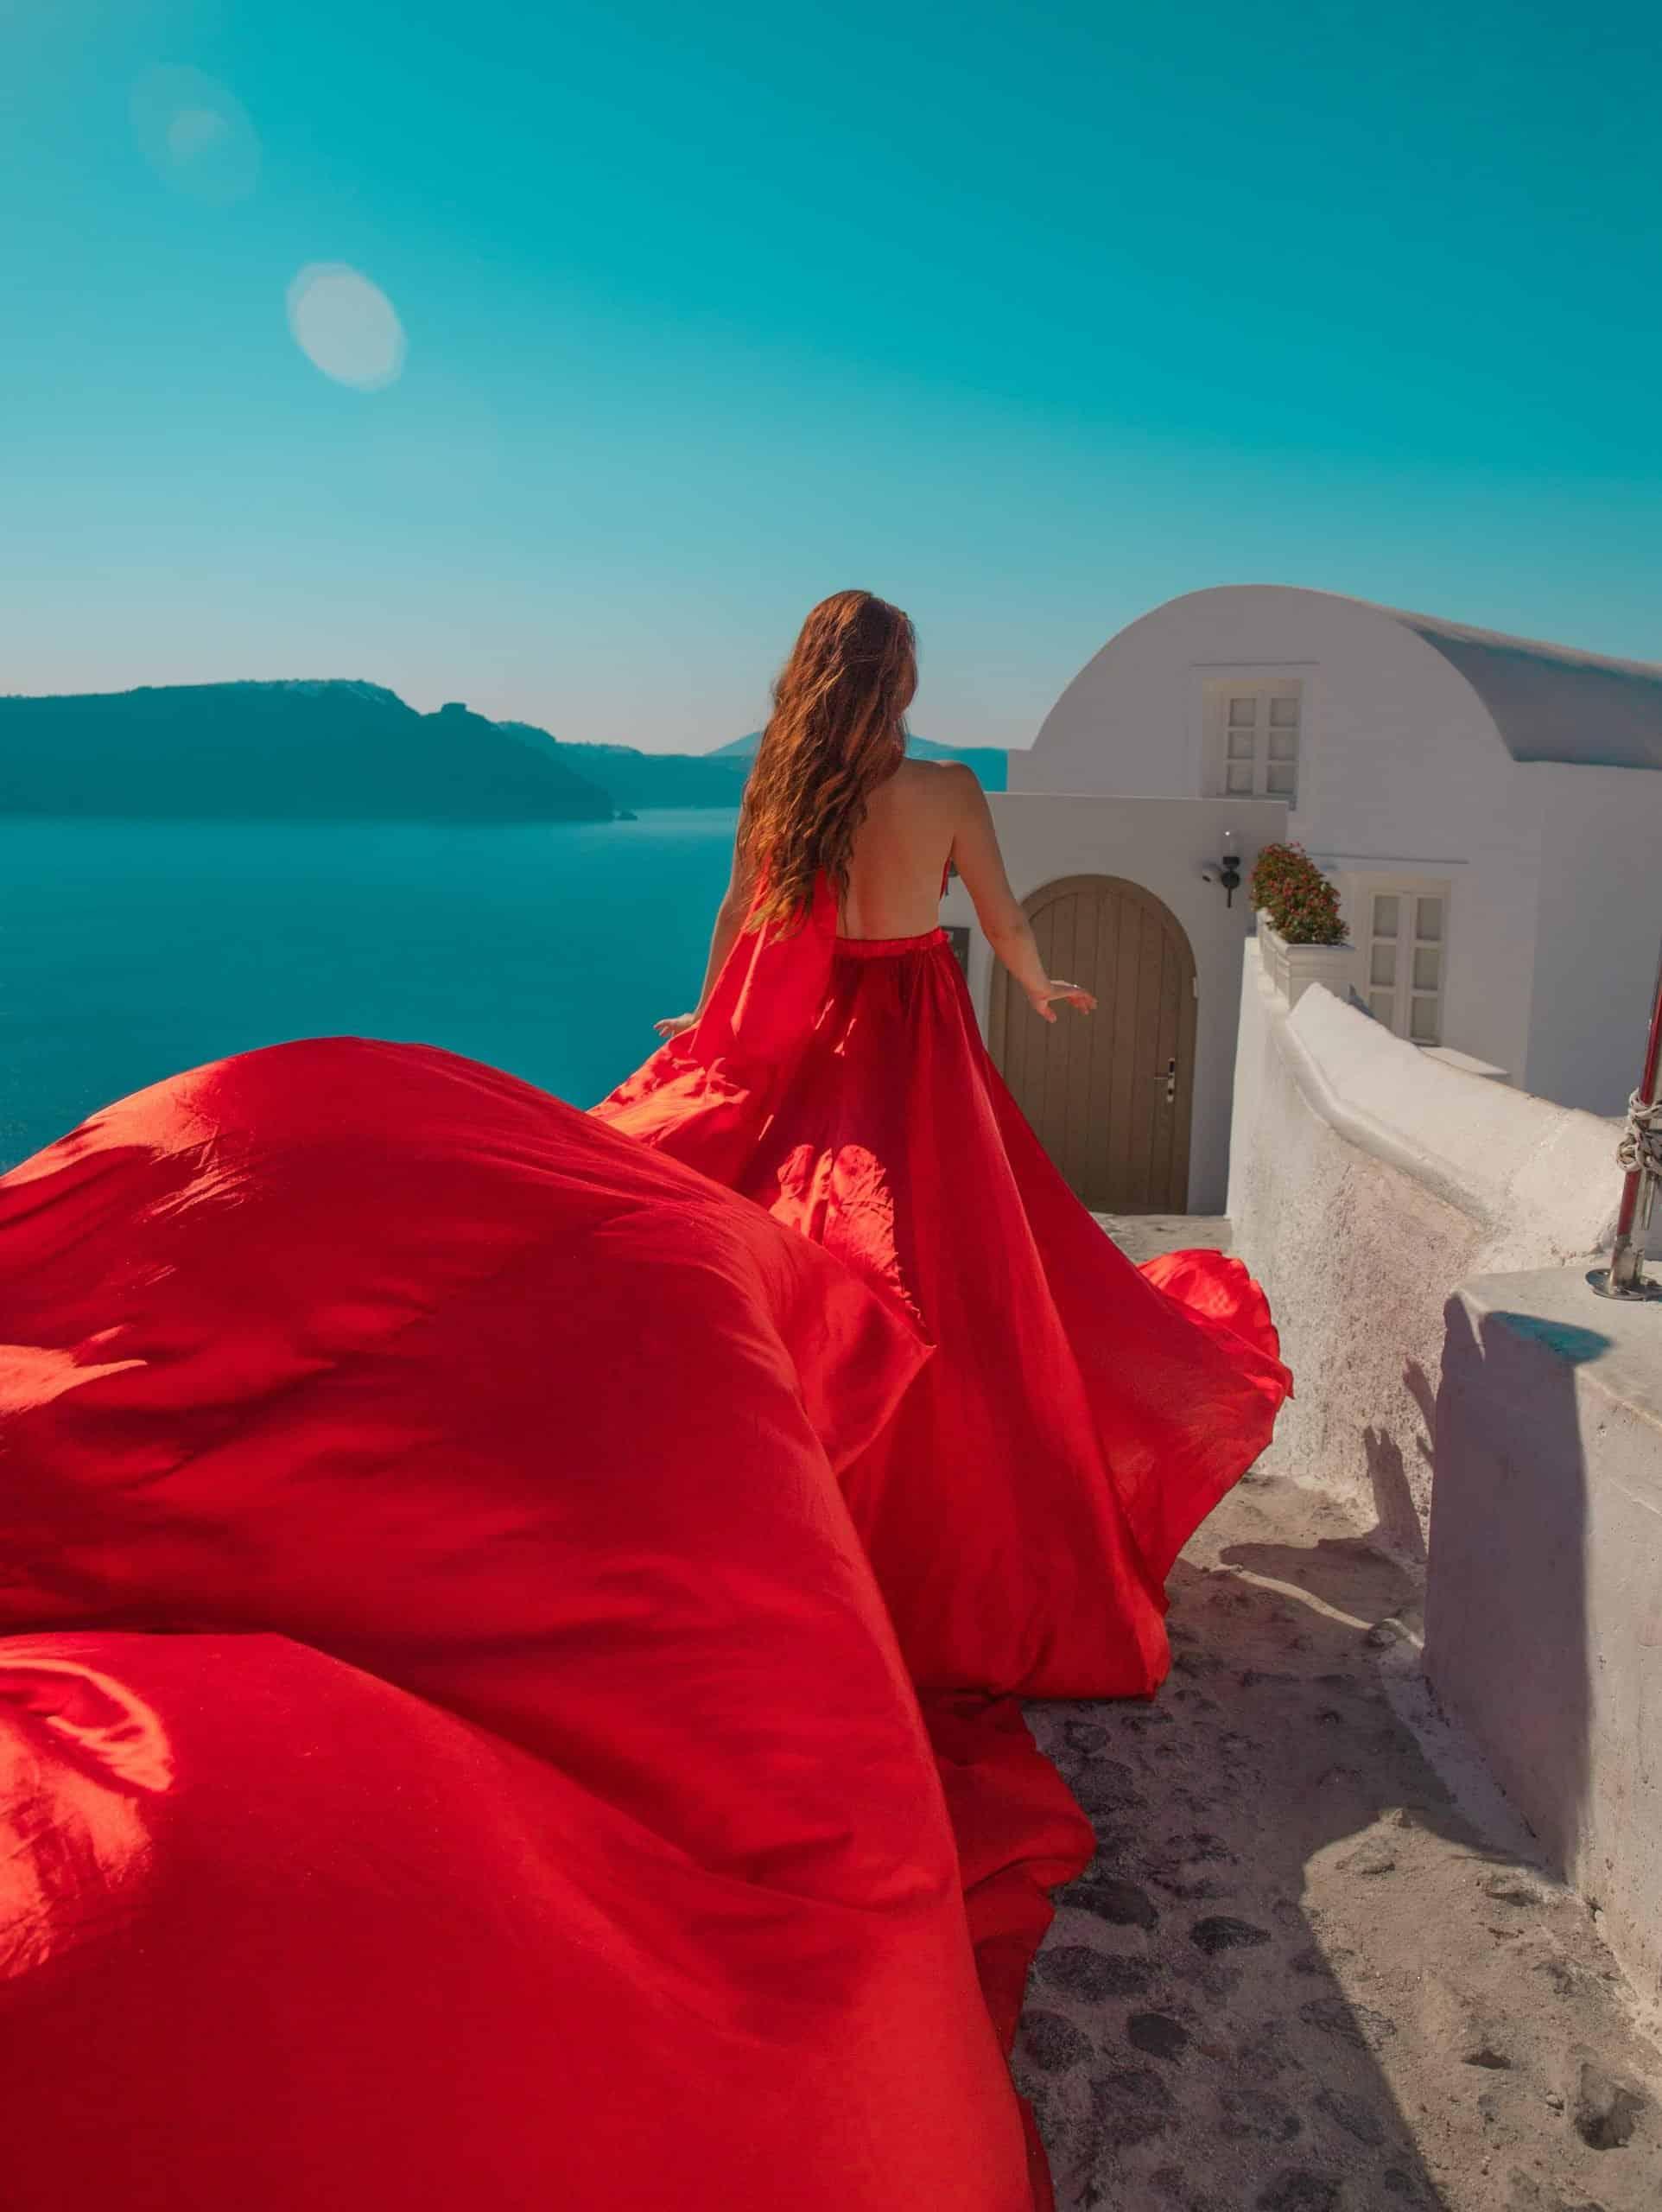 Bettina in Red Dress at Santorini House in Oia, Santorini